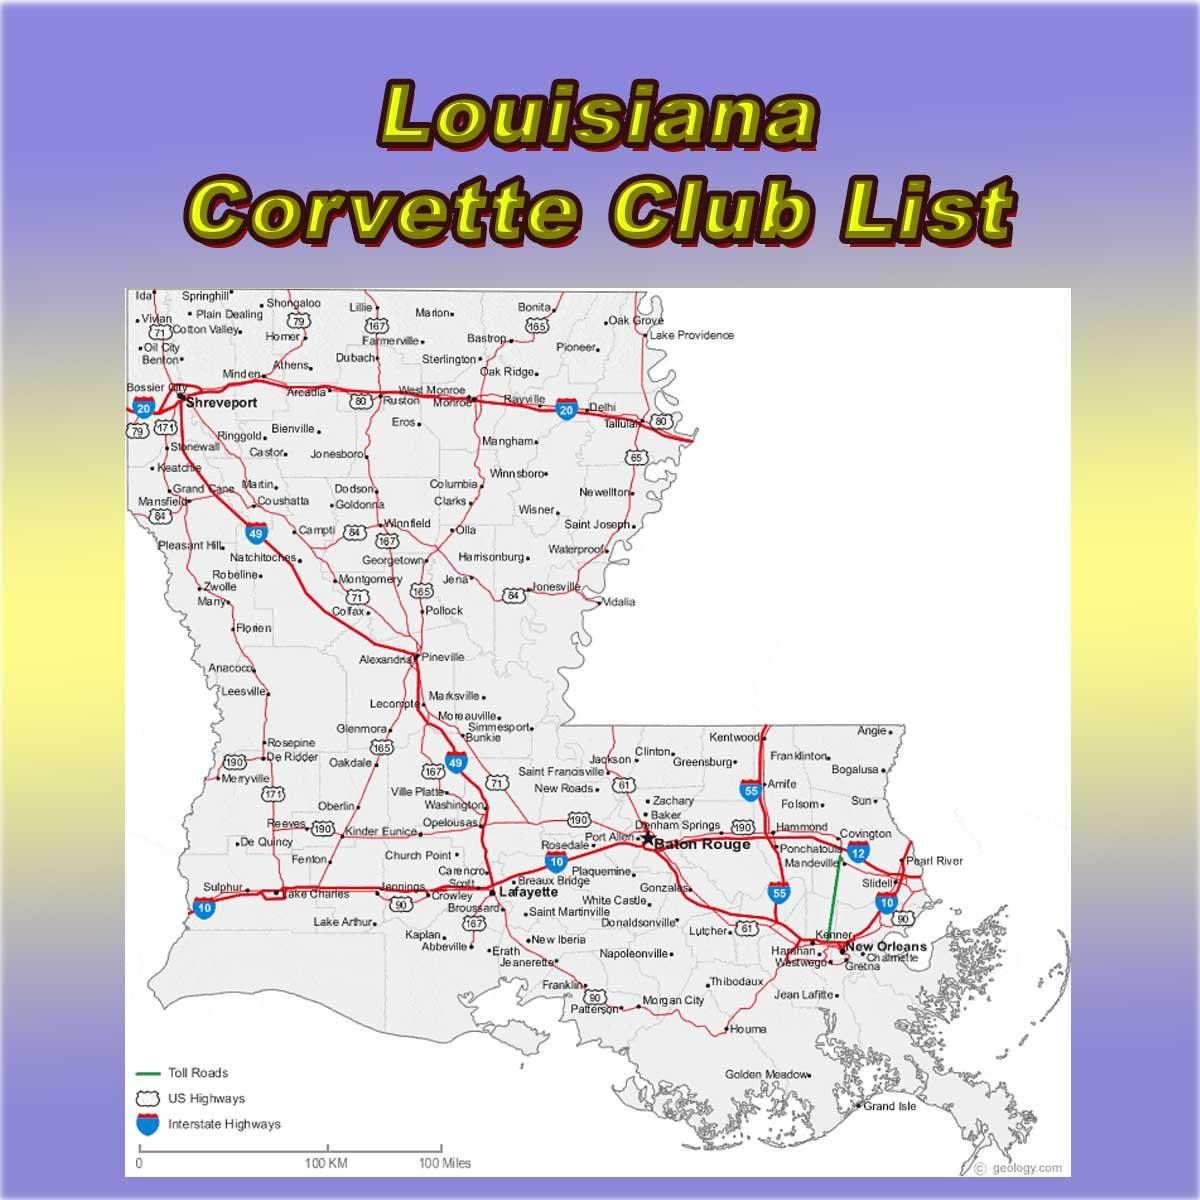 Louisiana Corvette Club Directory